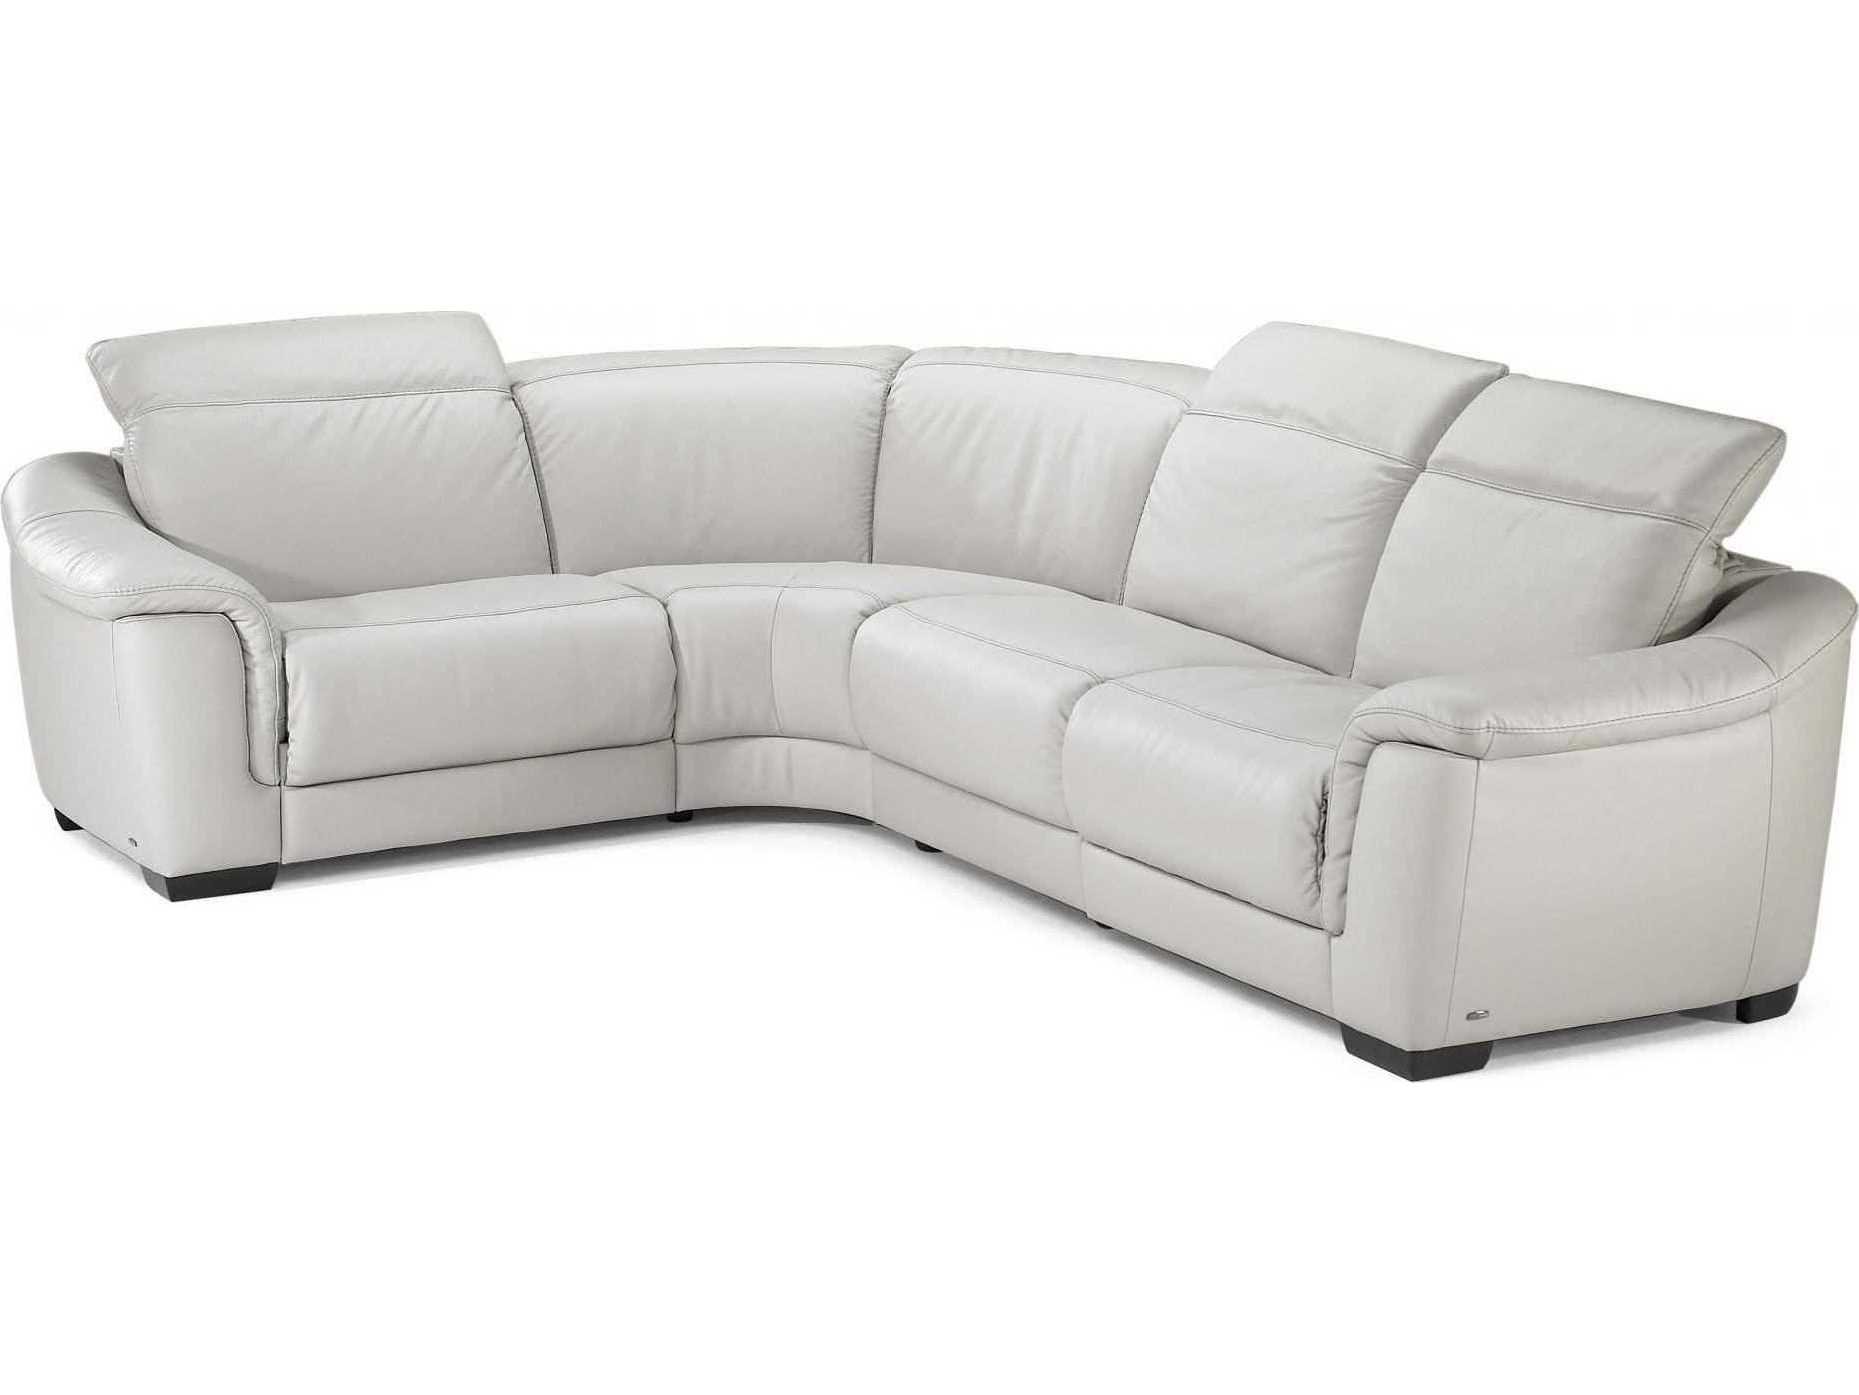 Natuzzi Editions Abele Sectional Sofa